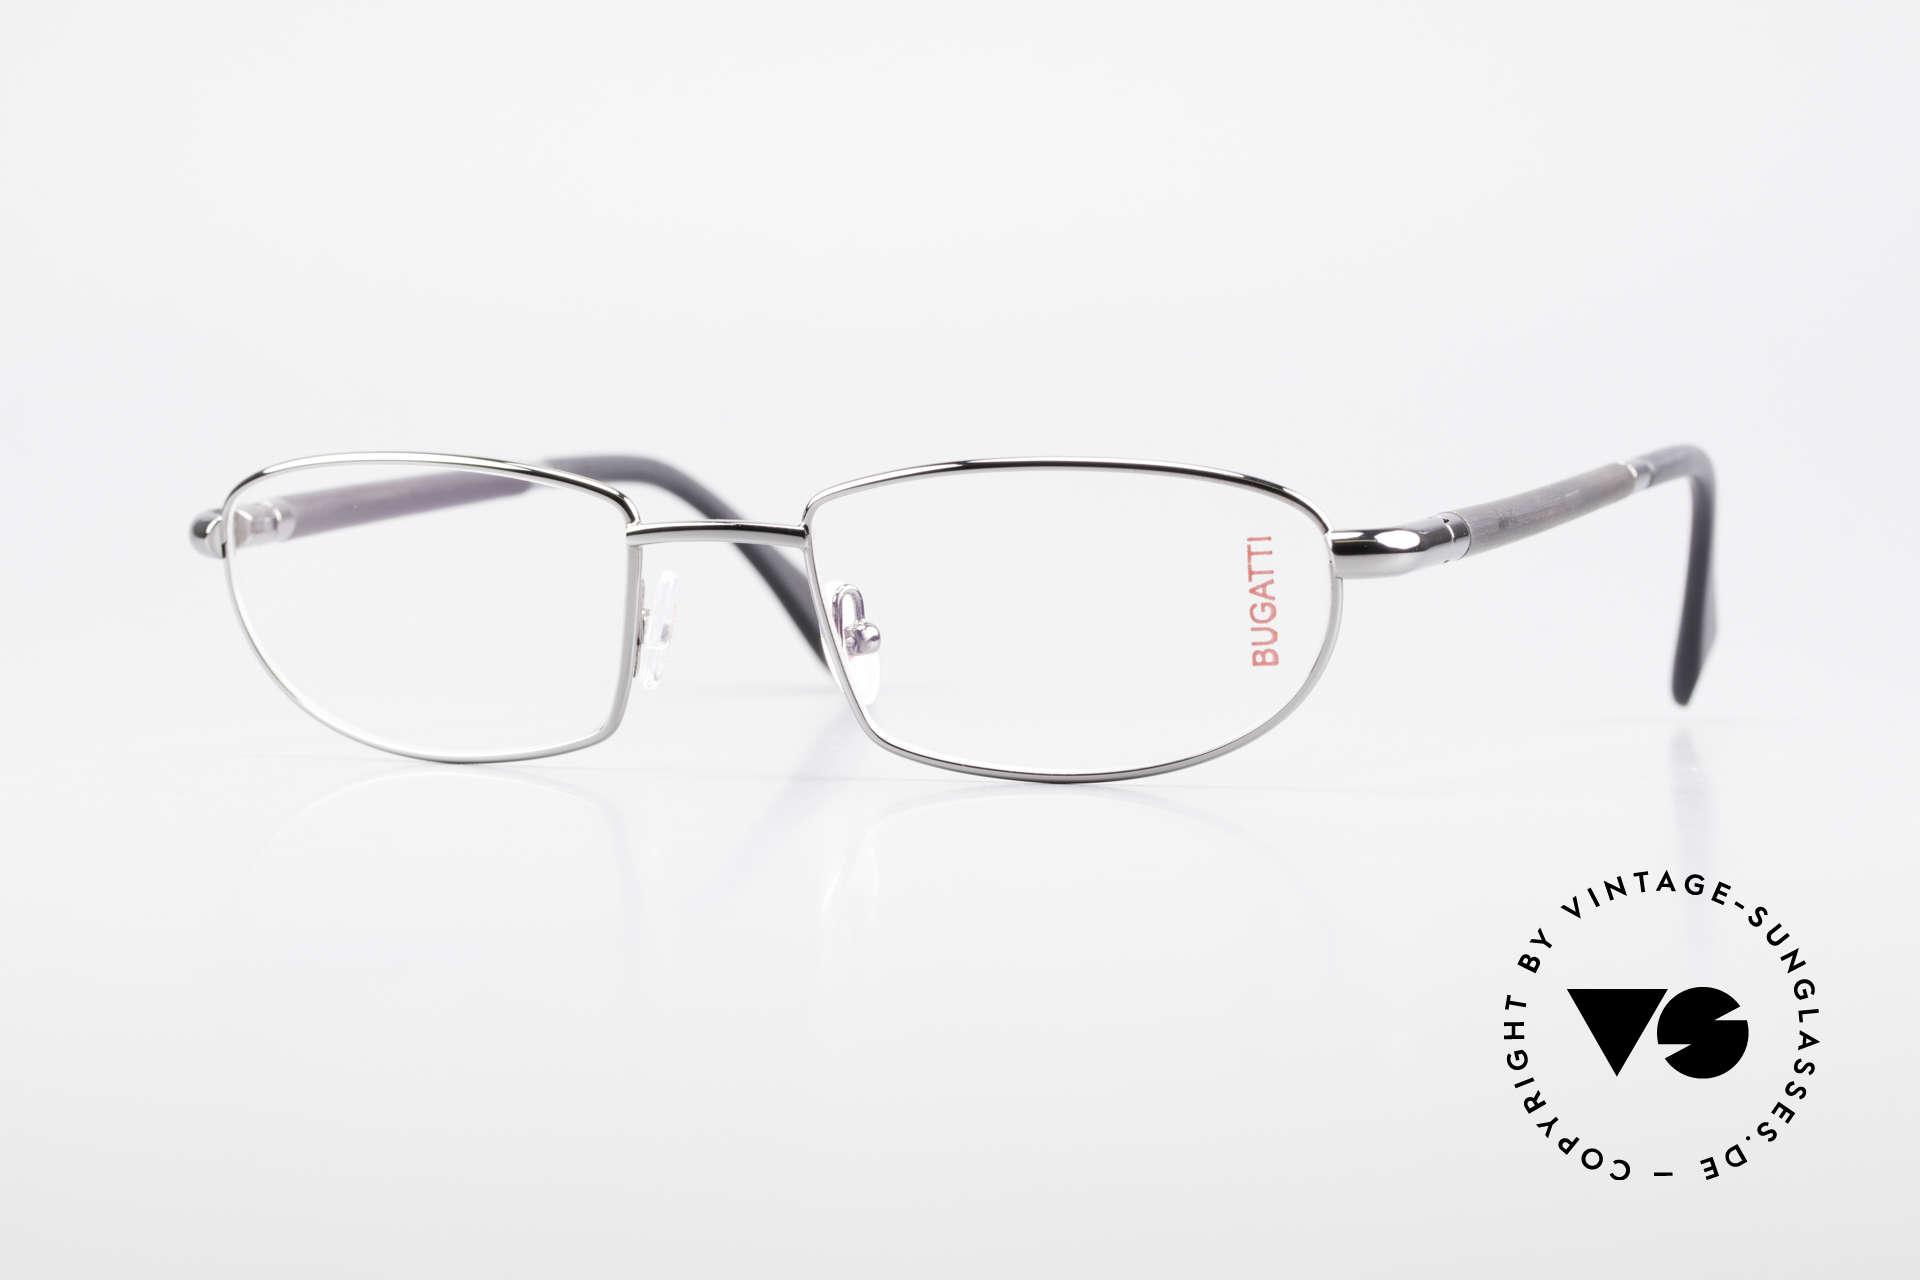 Bugatti 537 Genuine Horn Frame Ruthenium, luxury eyeglasses by BUGATTI, TOP-NOTCH quality, Made for Men